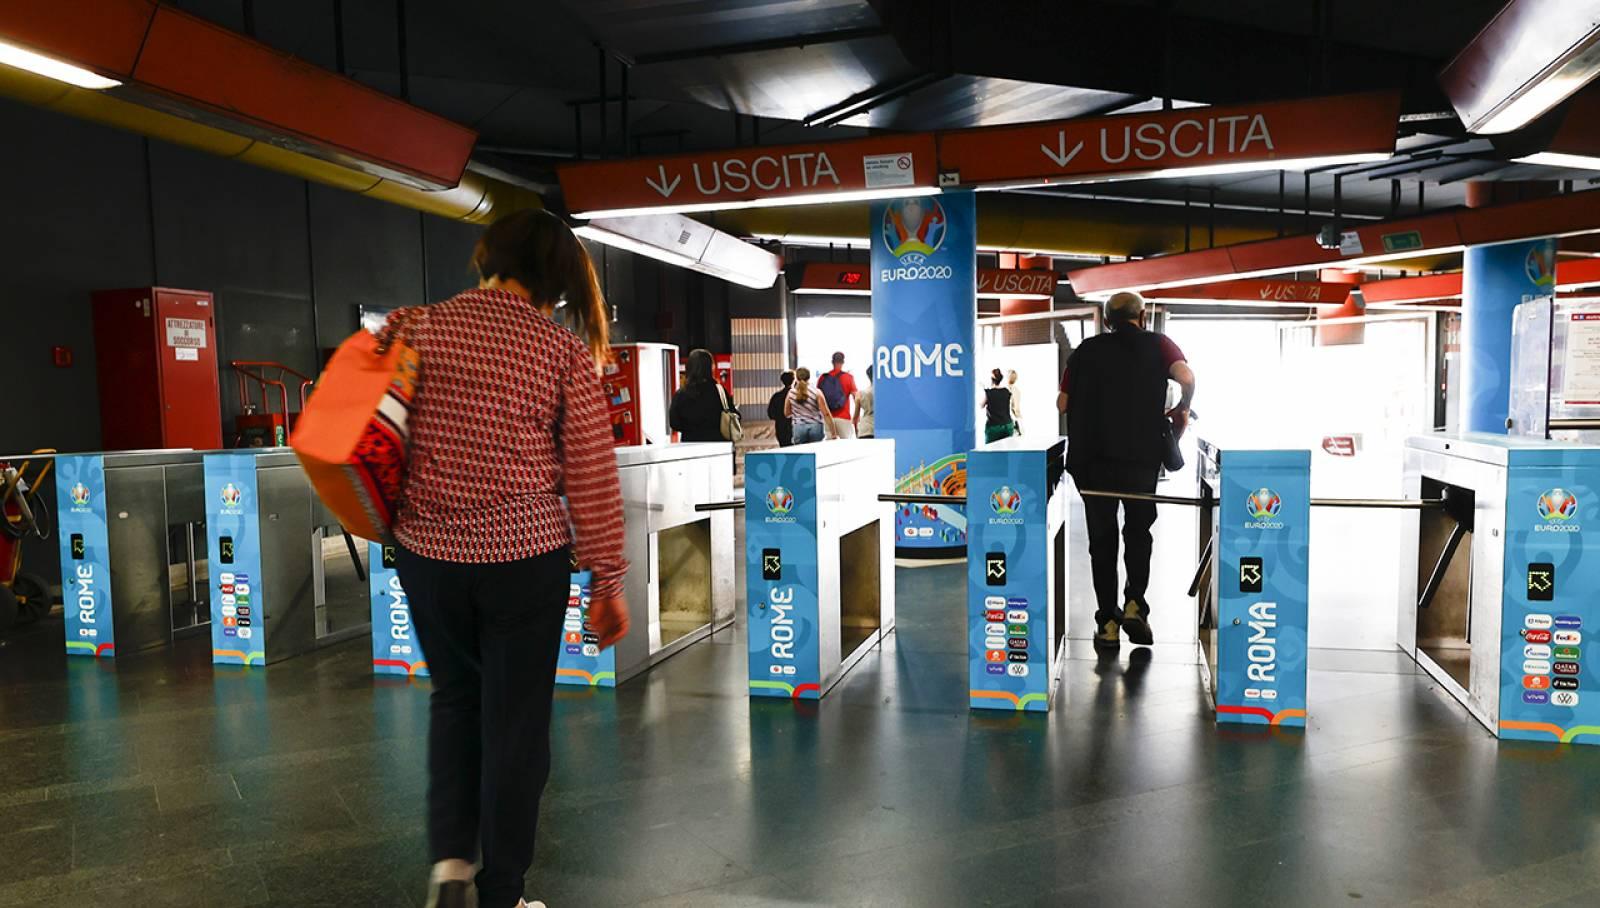 Pubblicità in metropolitana a Roma Station Domination Cipro per UEFA 2020 IGPDecaux